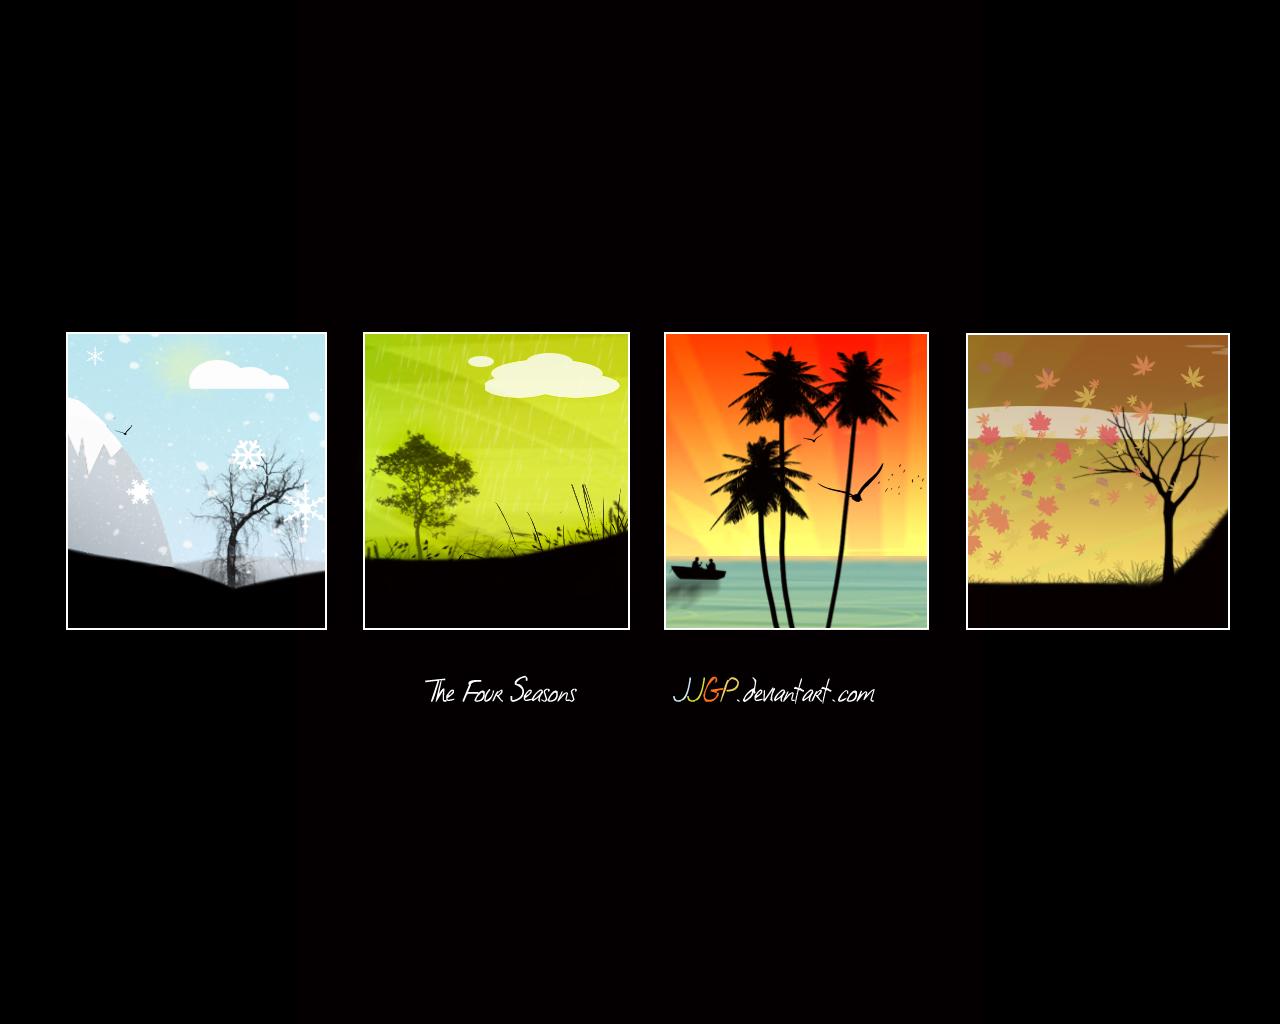 four season change free desktop download wallpapers